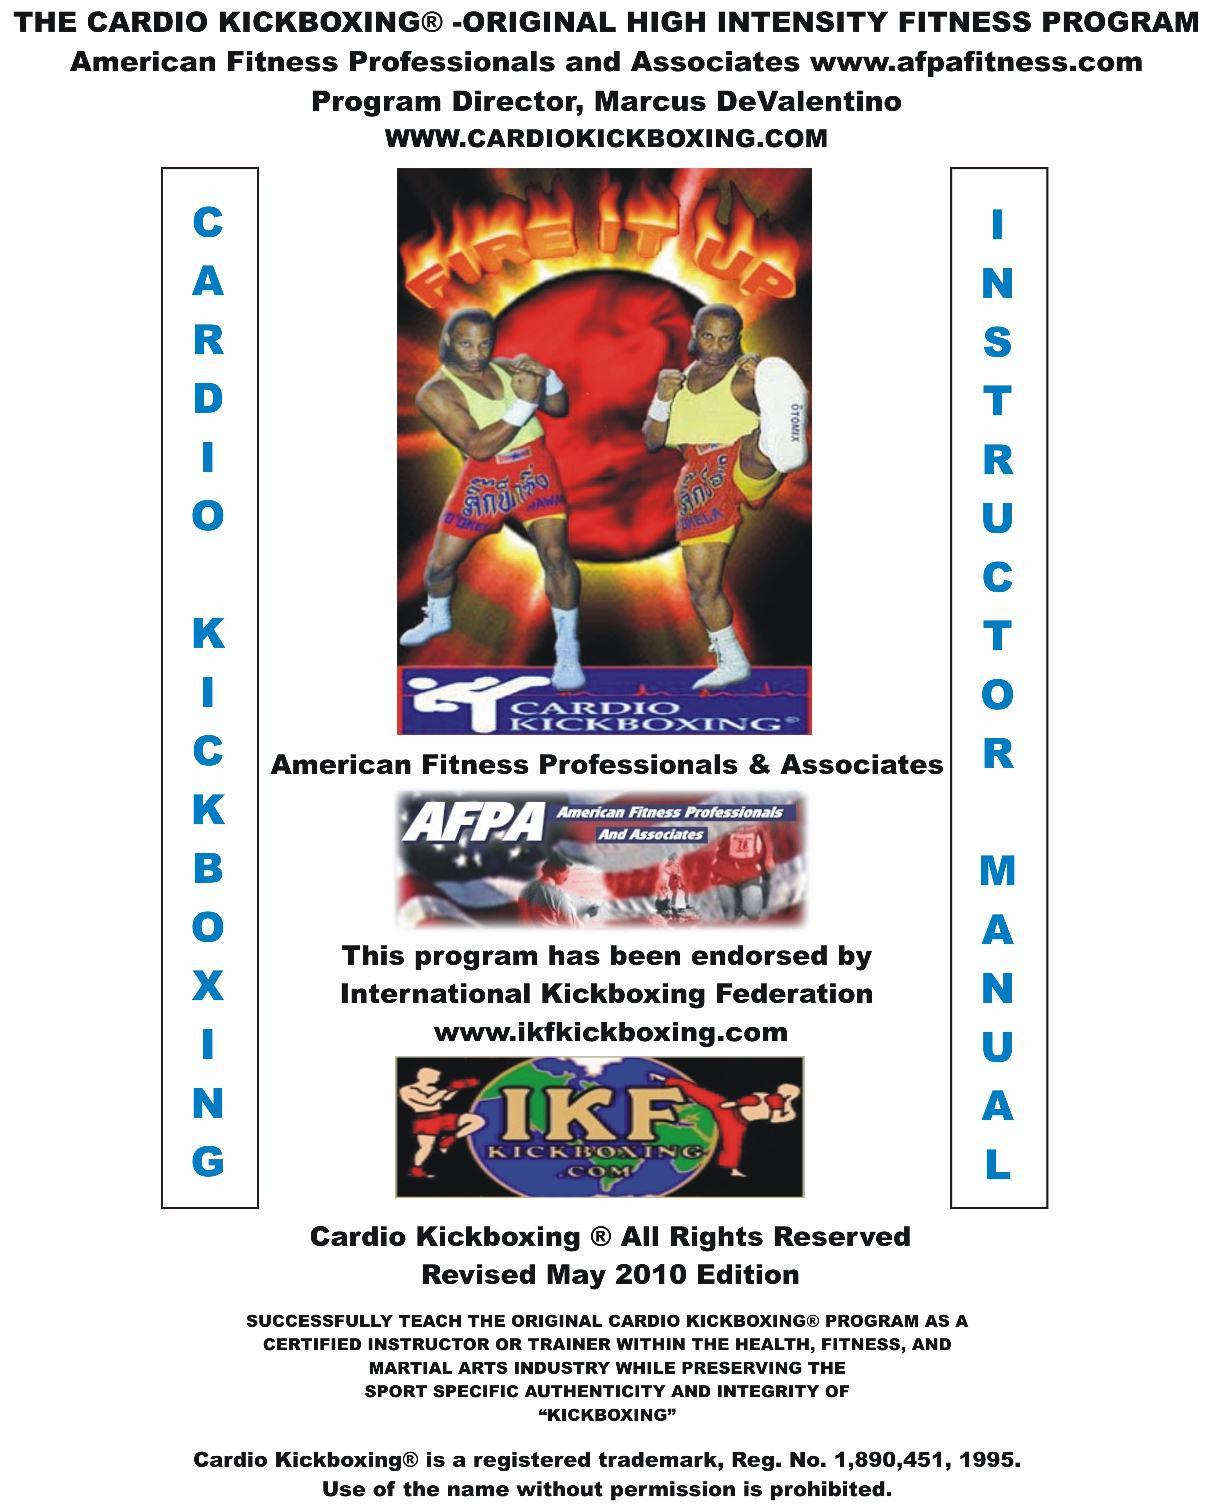 Cardio Kickboxing Home Page